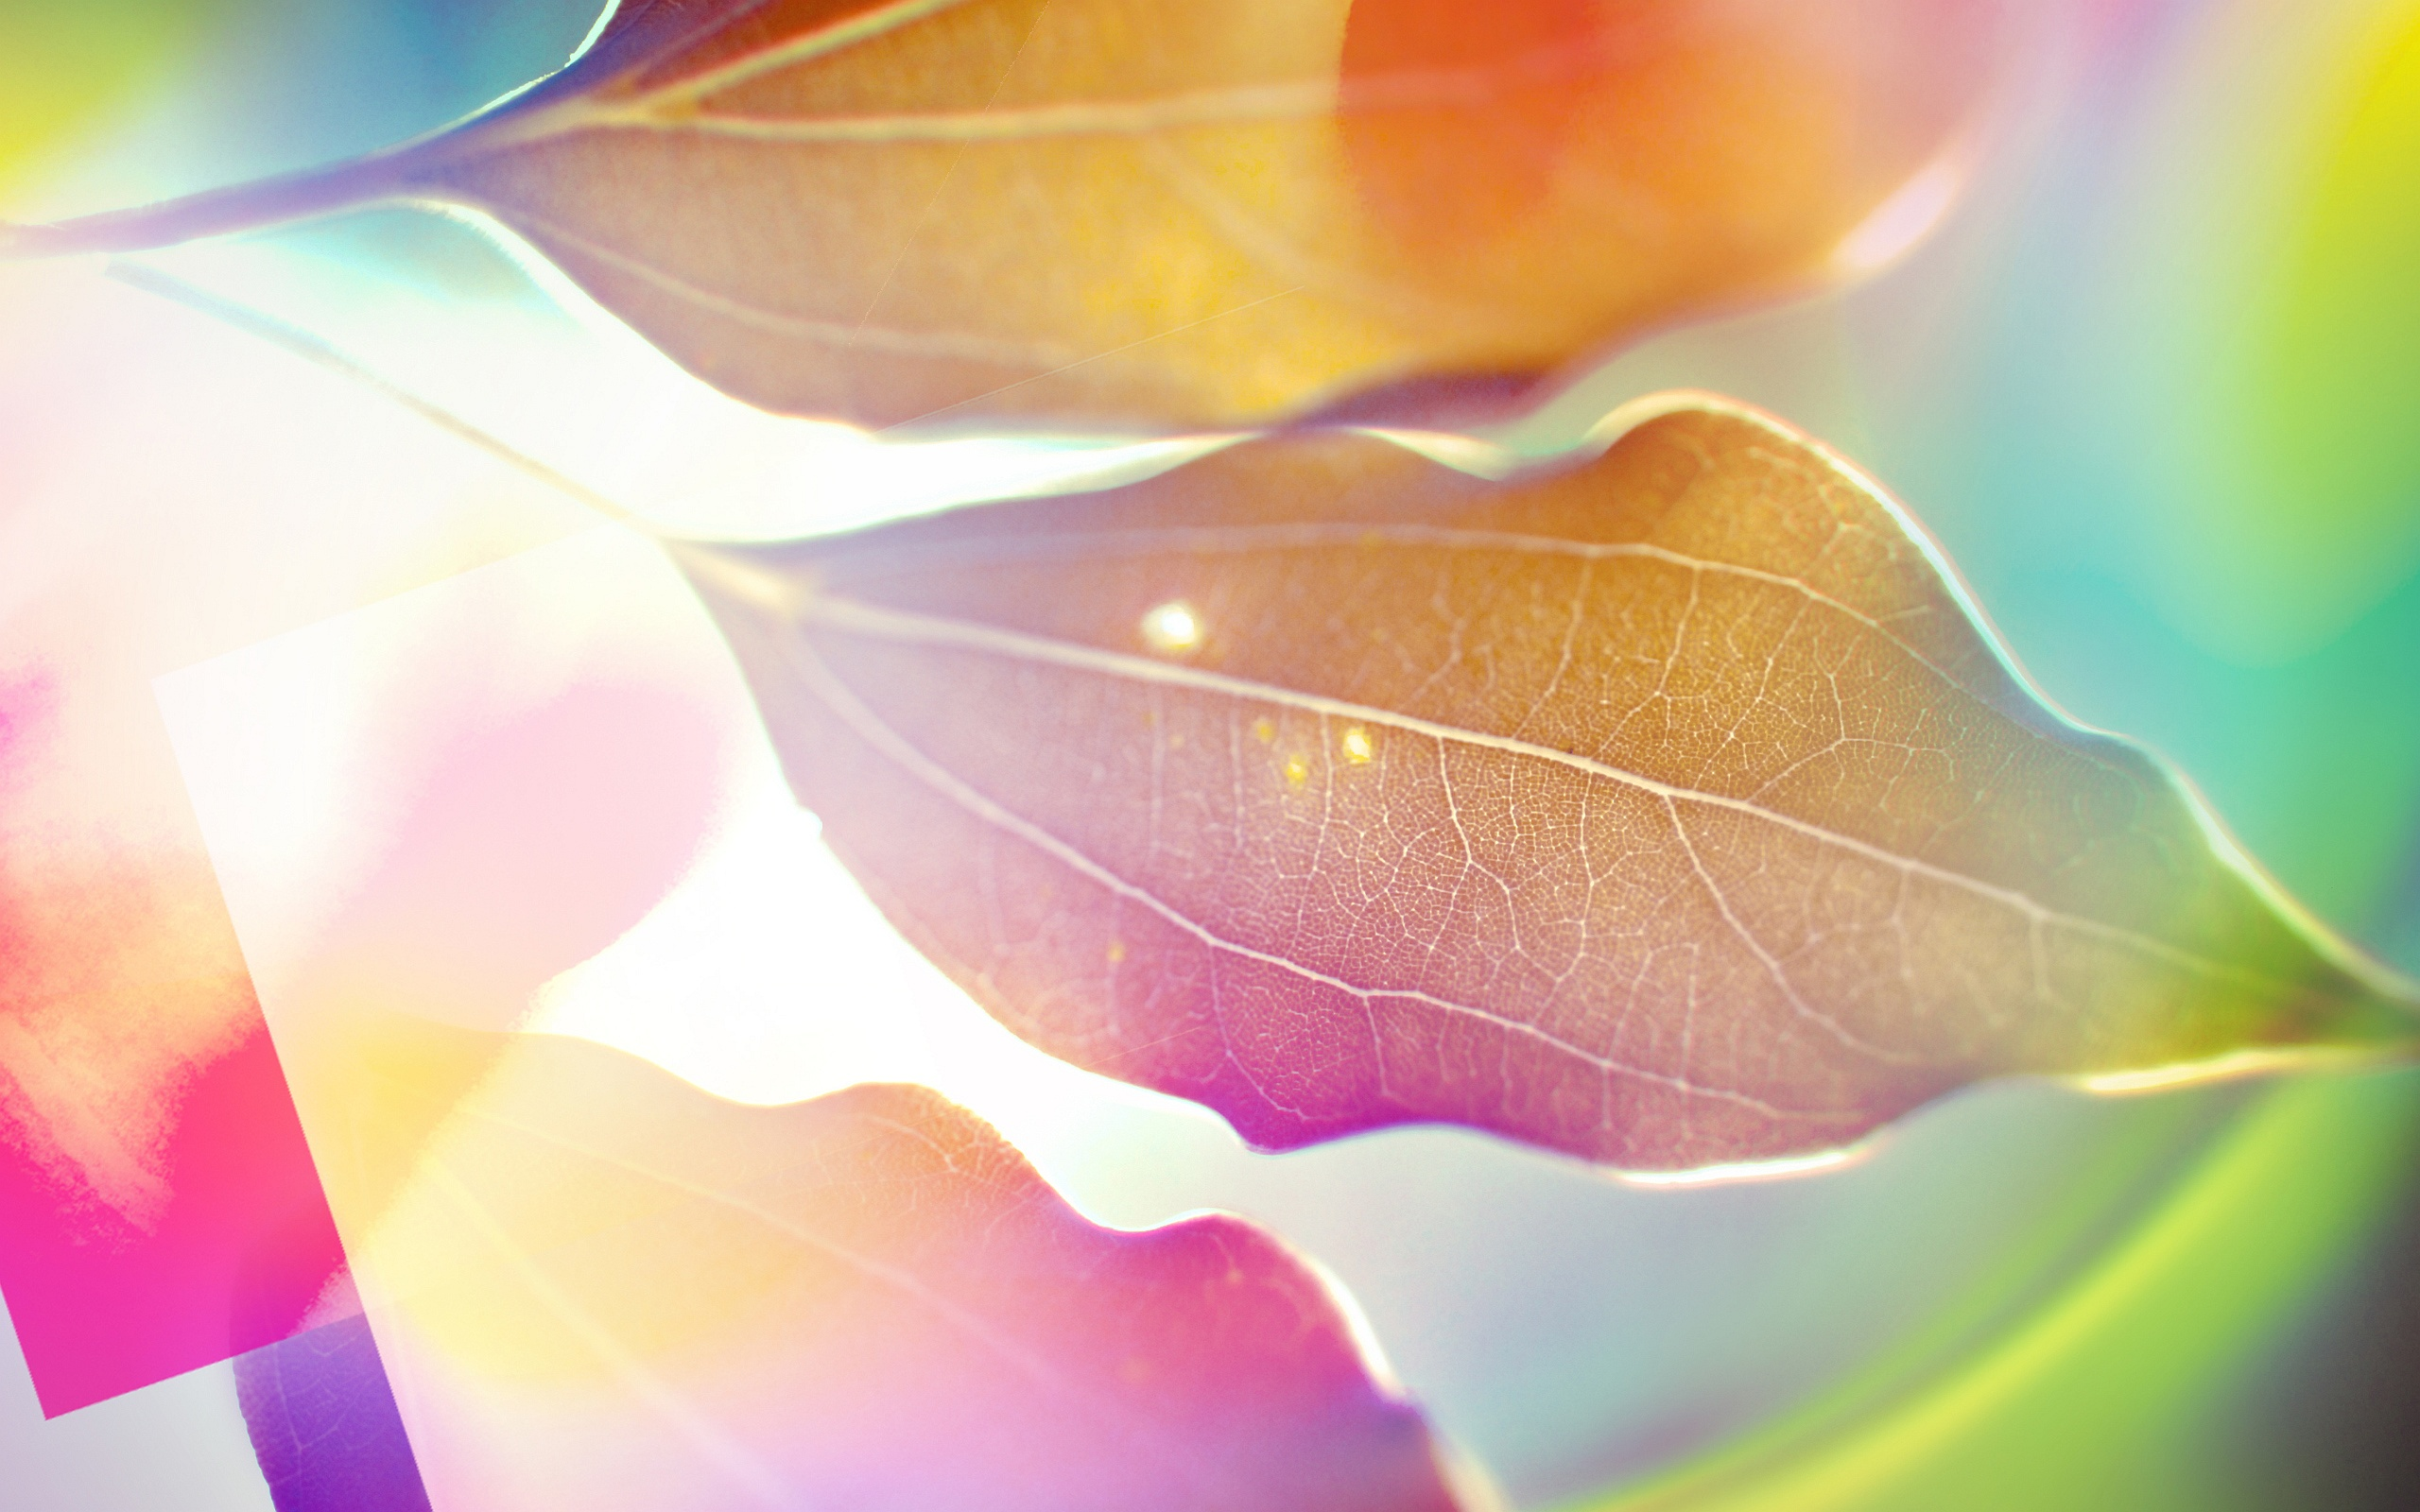 Rama 3d Name Wallpapers Leaves Picture Sunlight Hd Desktop Wallpapers 4k Hd